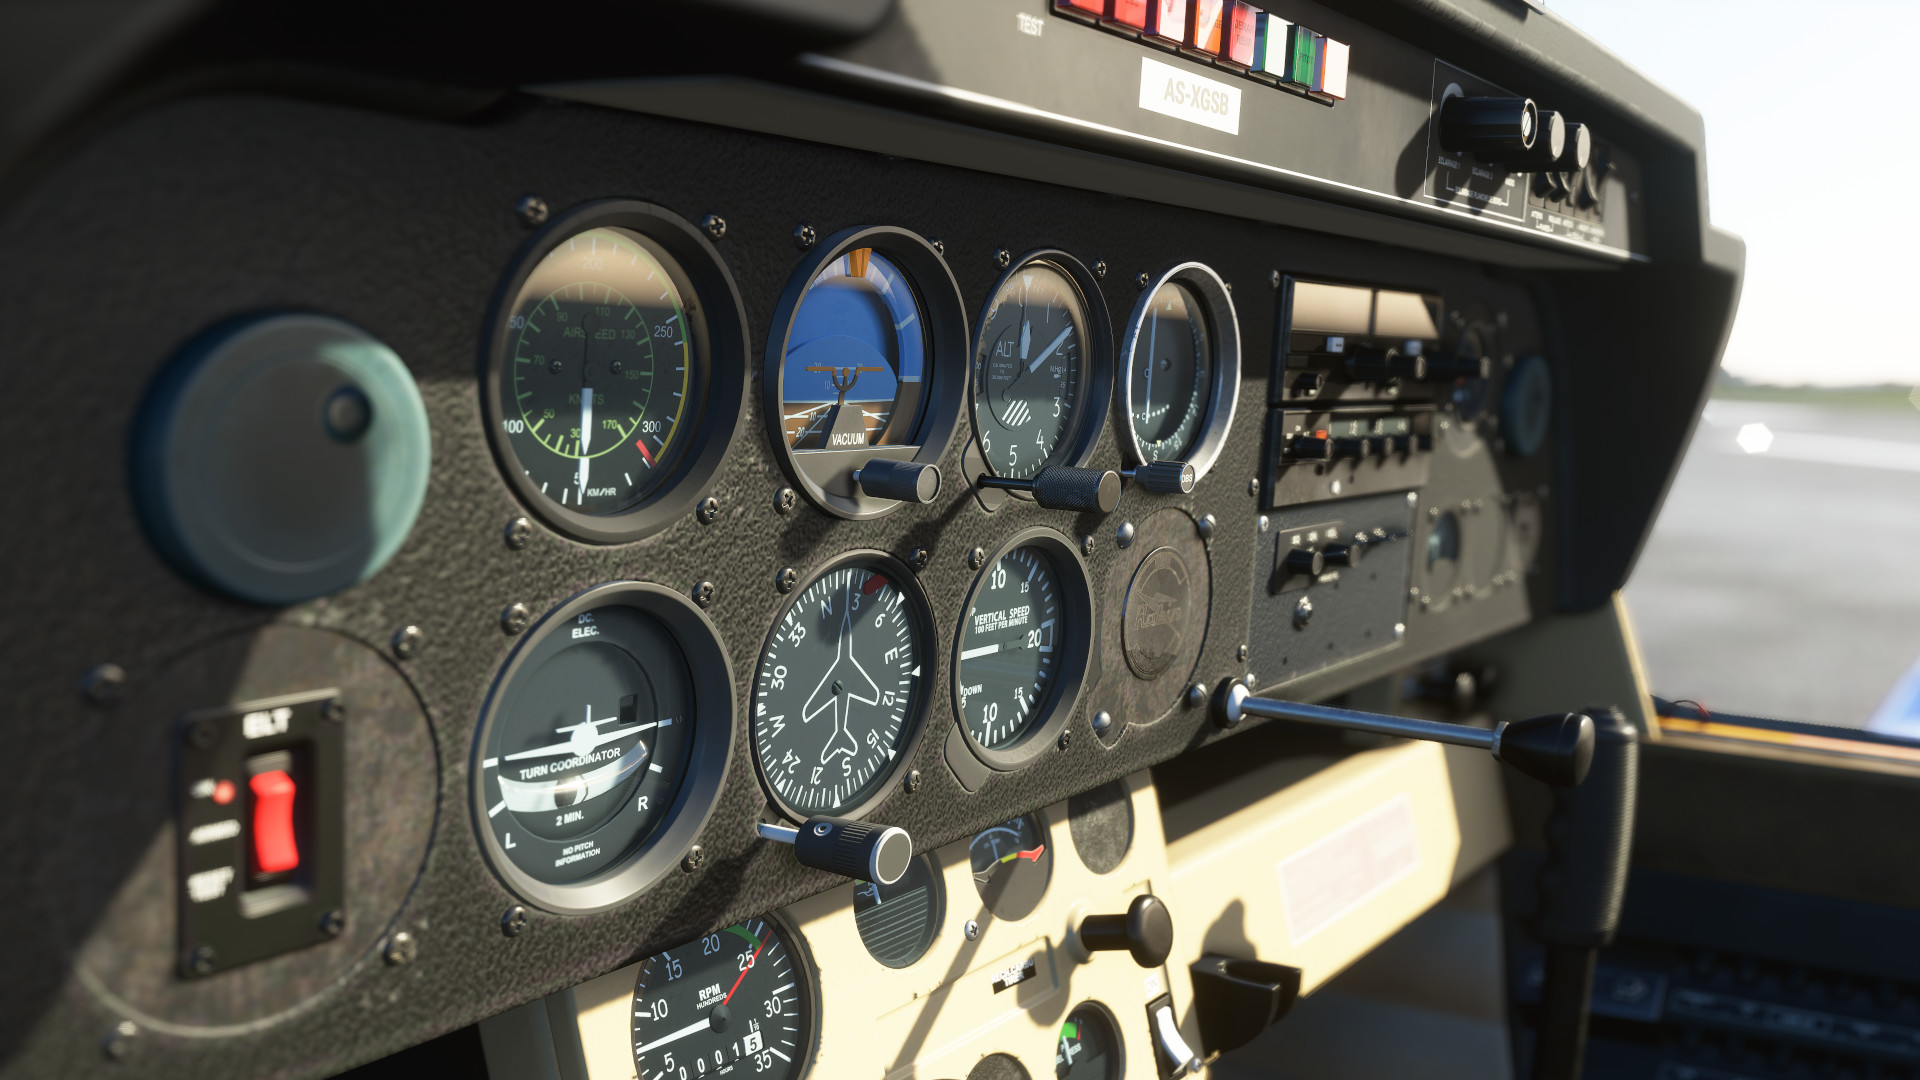 Microsoft Flight Simulator (2020) Screenshot 2